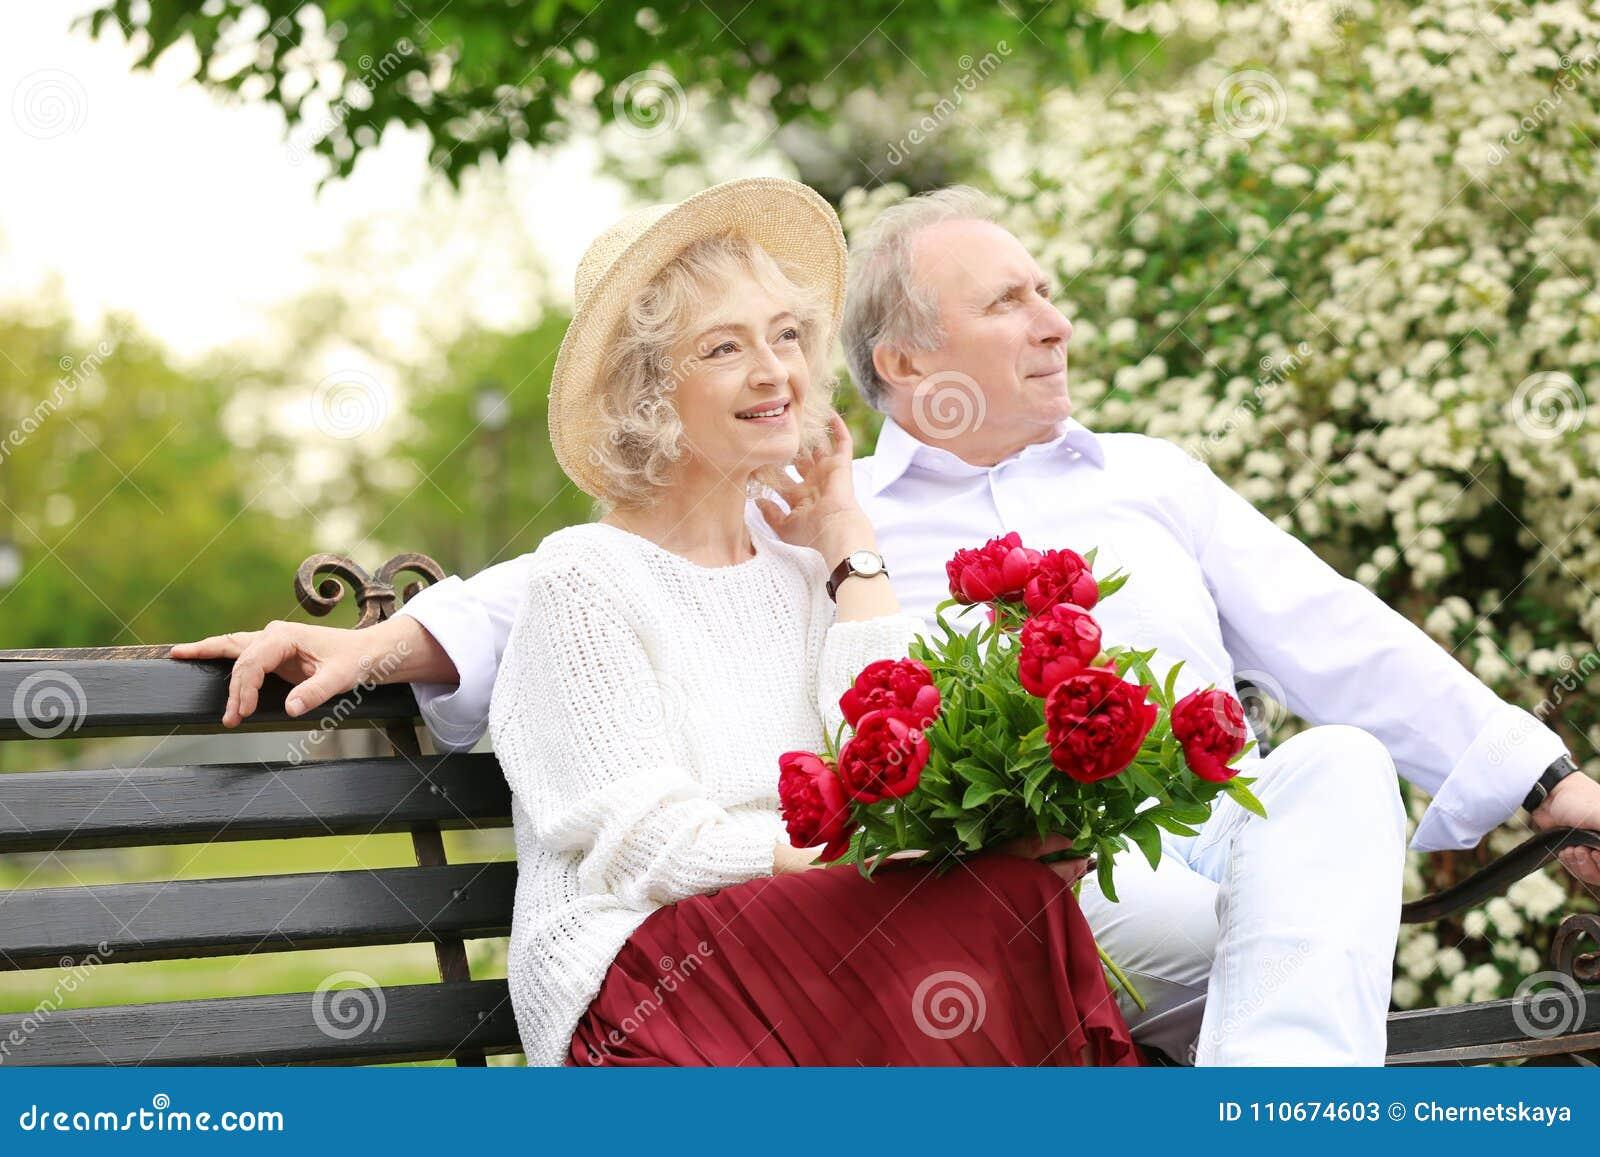 Happy senior couple sitting on bench